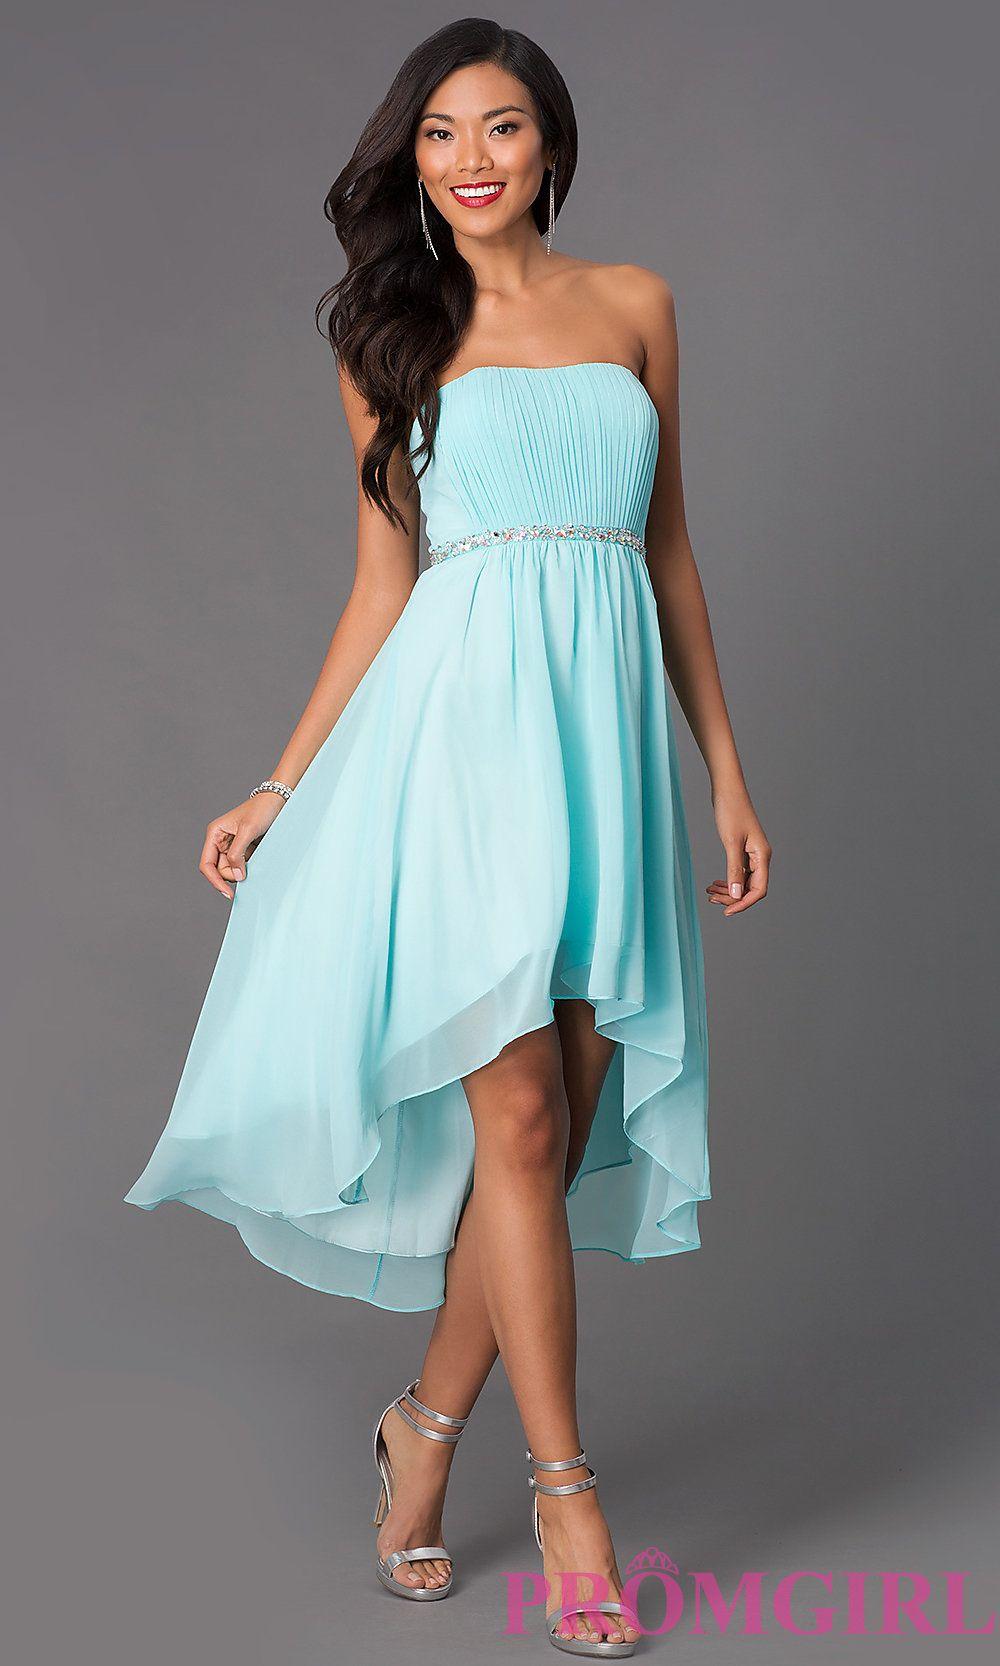 Teal High Low Dress   Good Dresses